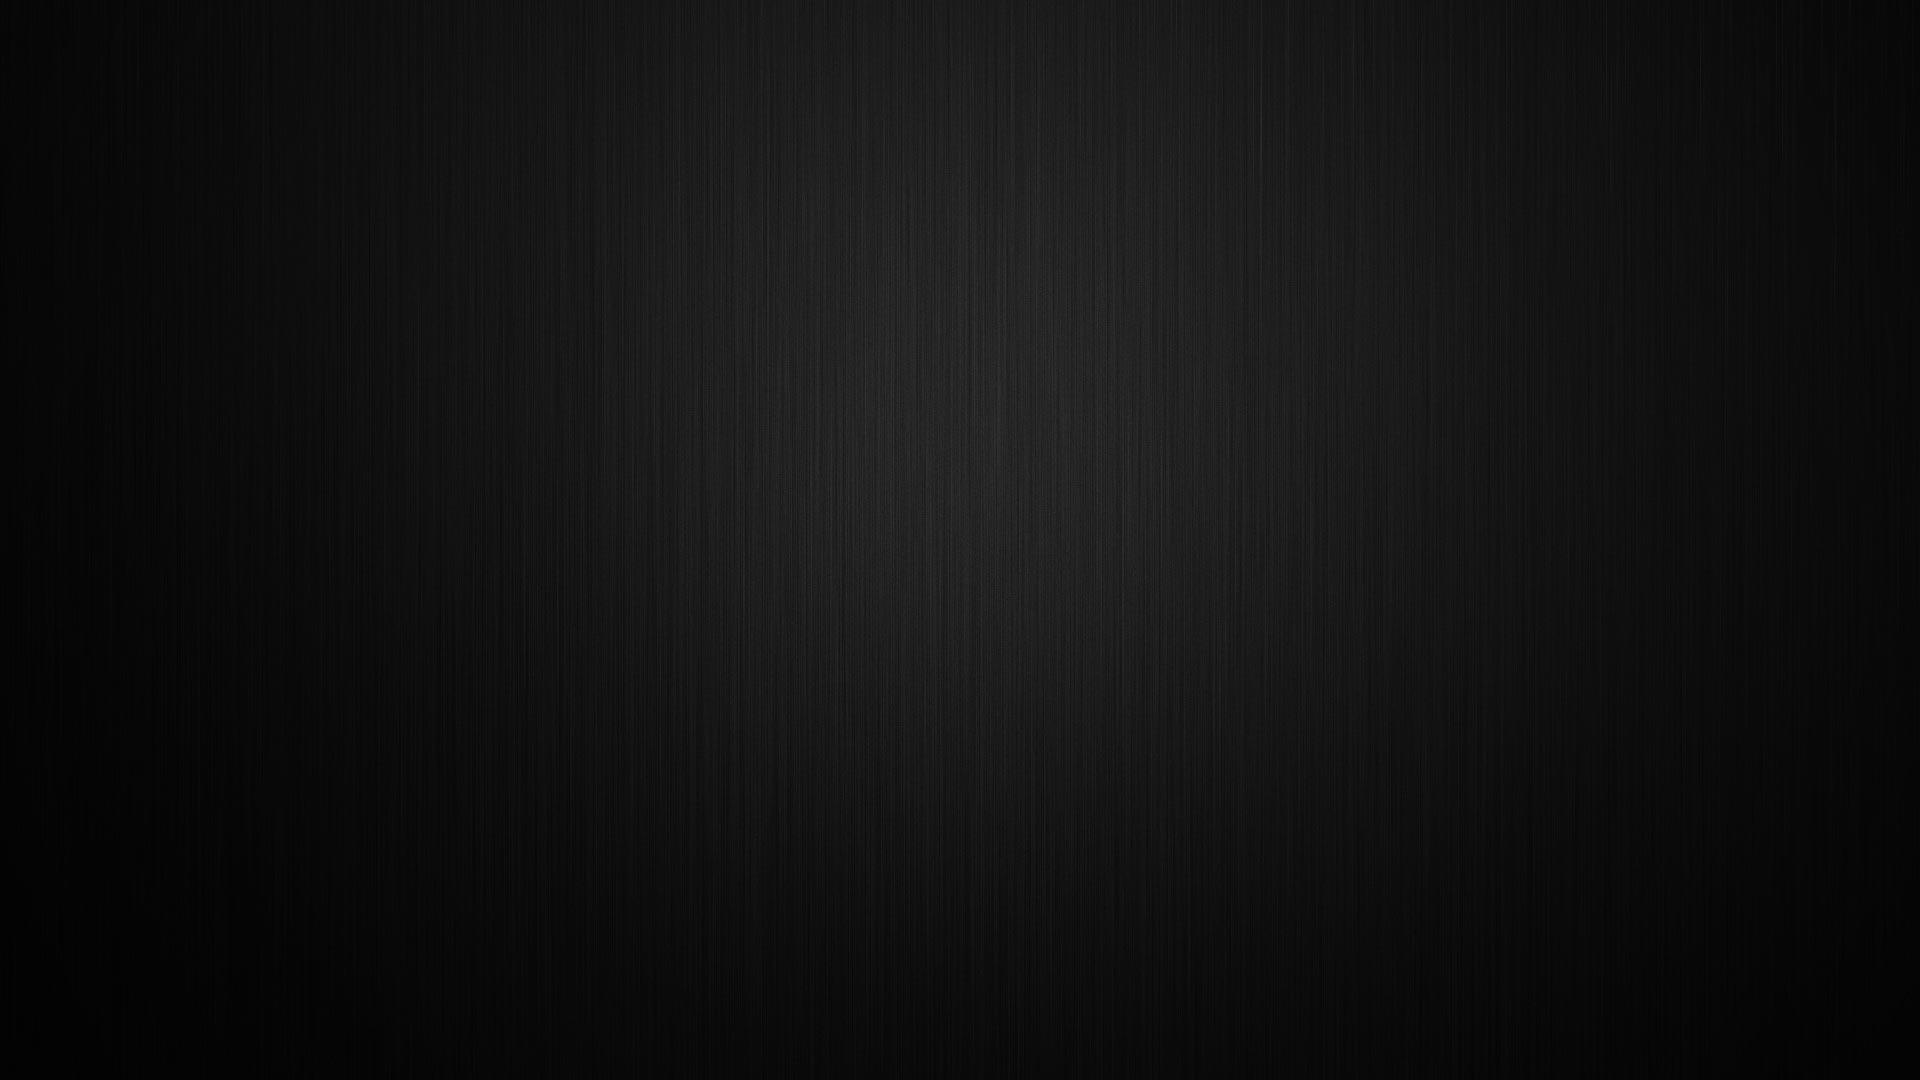 wallpaper 2560x1080 pack